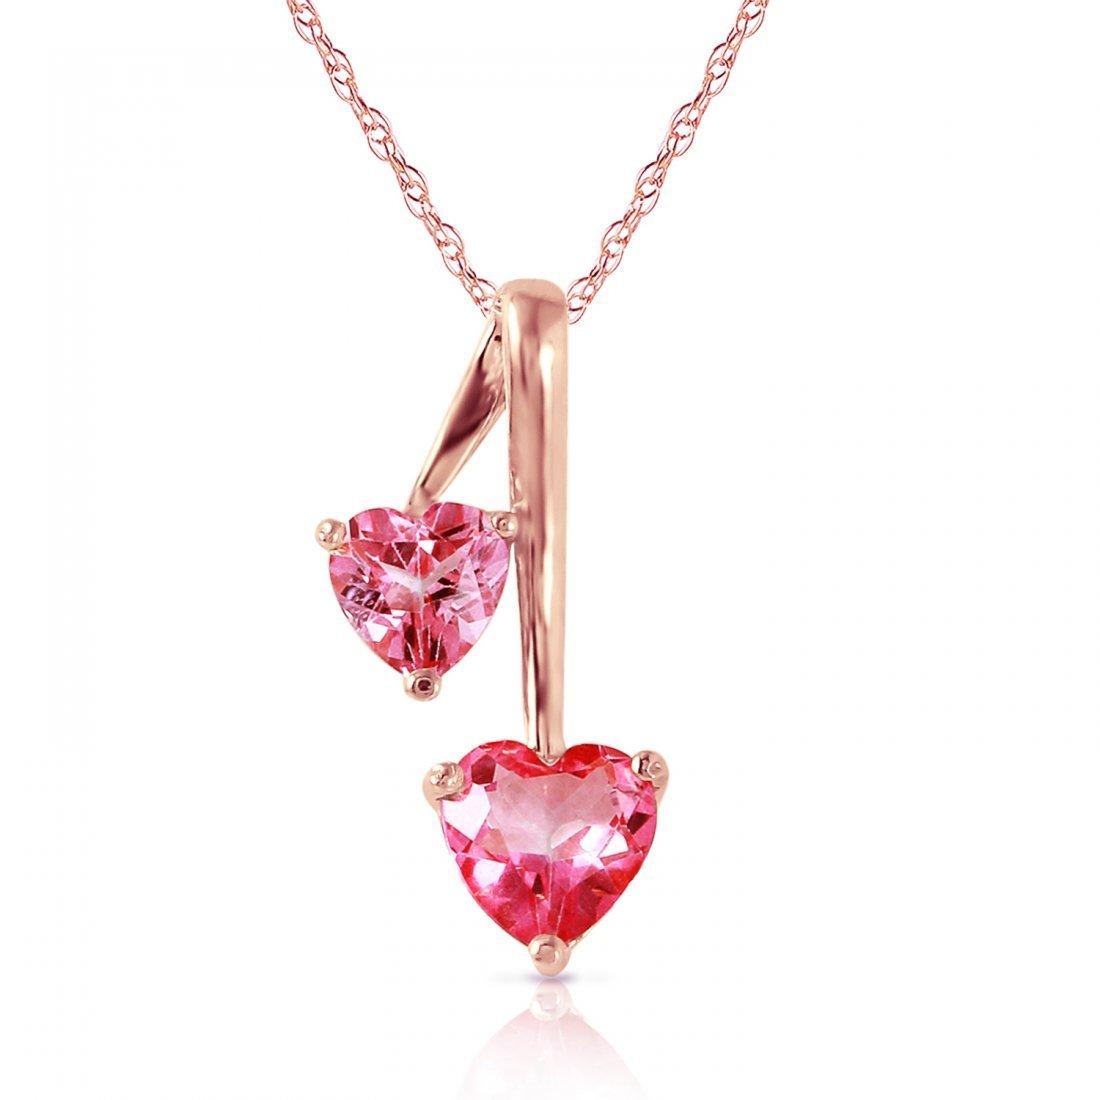 Genuine 1.40 ctw Pink Topaz Necklace Jewelry 14KT Rose